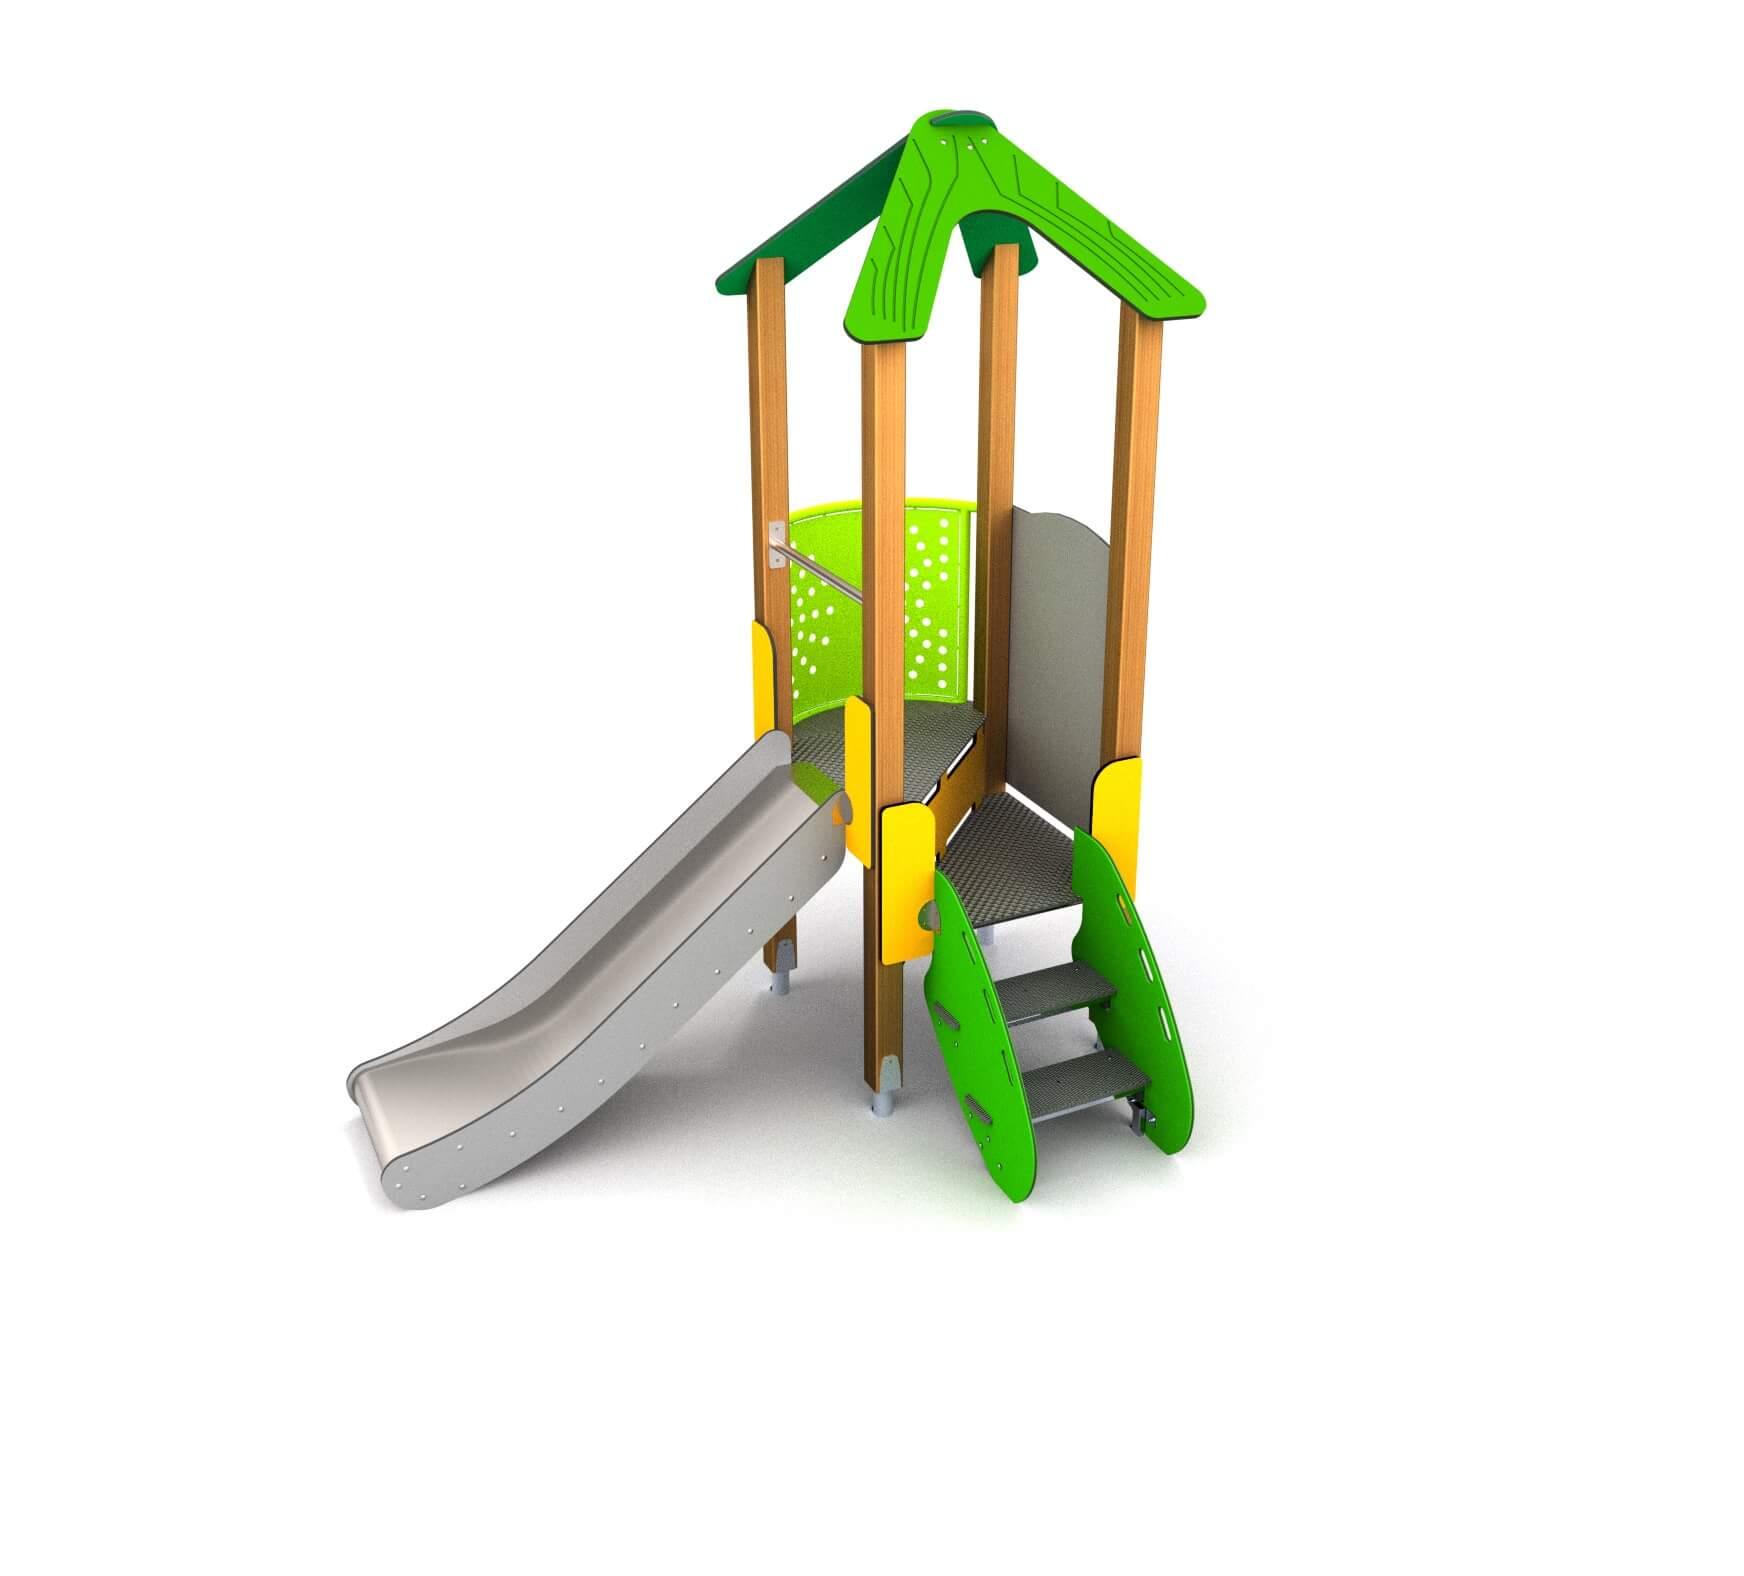 7cb6efbb1b7095 Surrey houten speeltoestel - Arkema Speelvoorzieningen